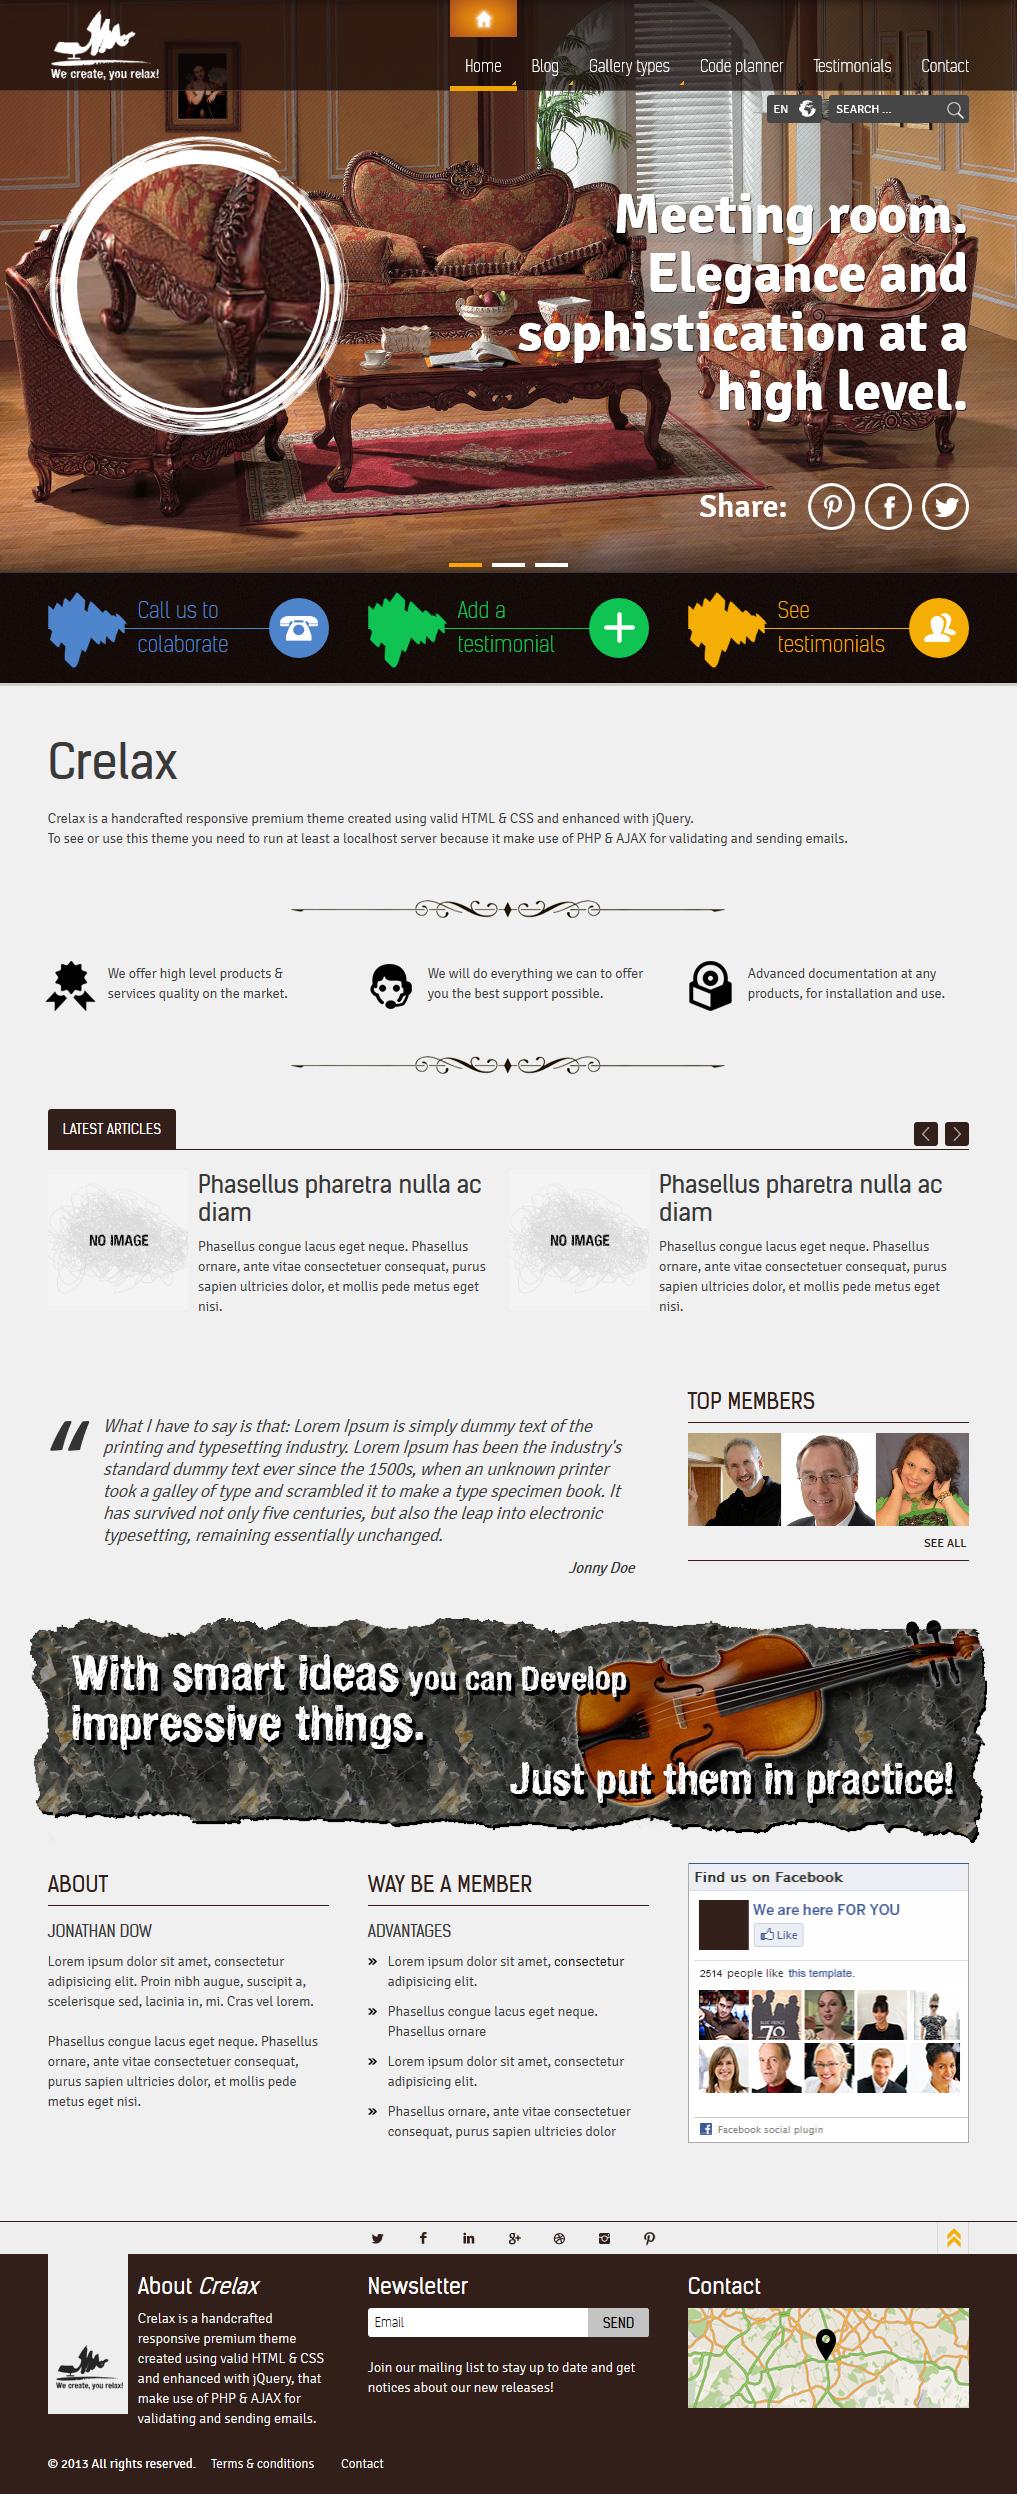 Crelax